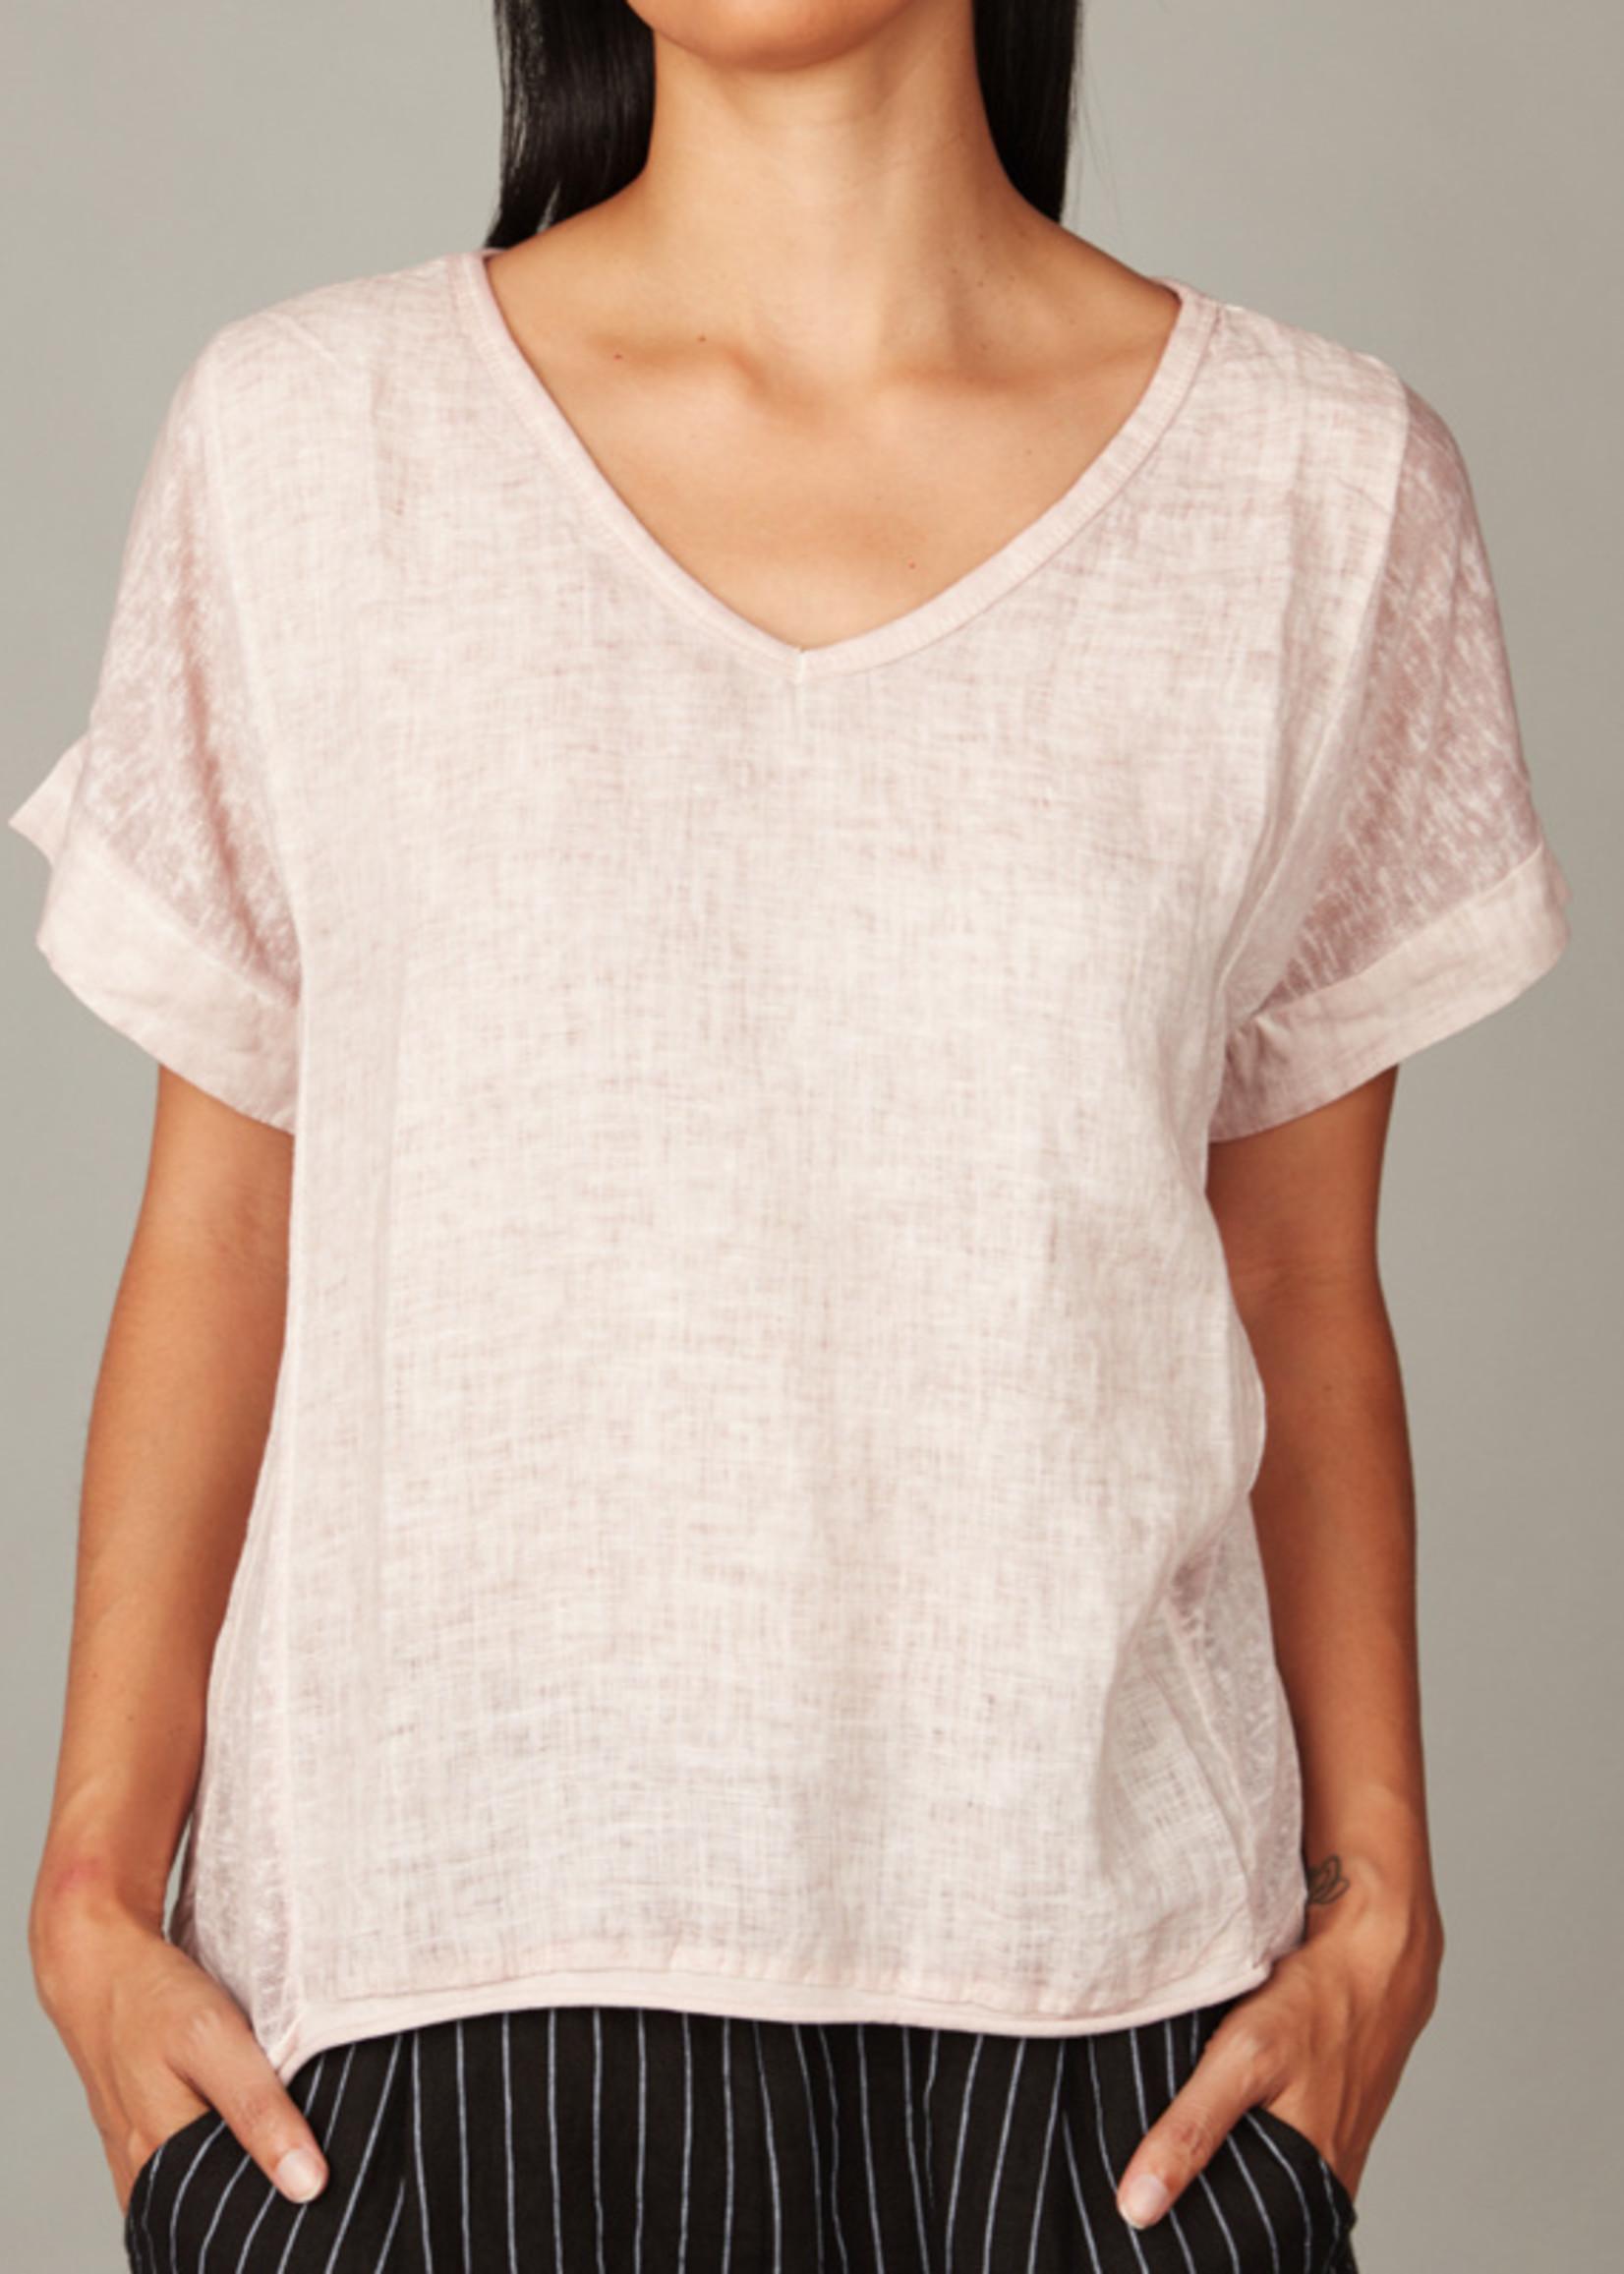 pistache Linen and Woven Top